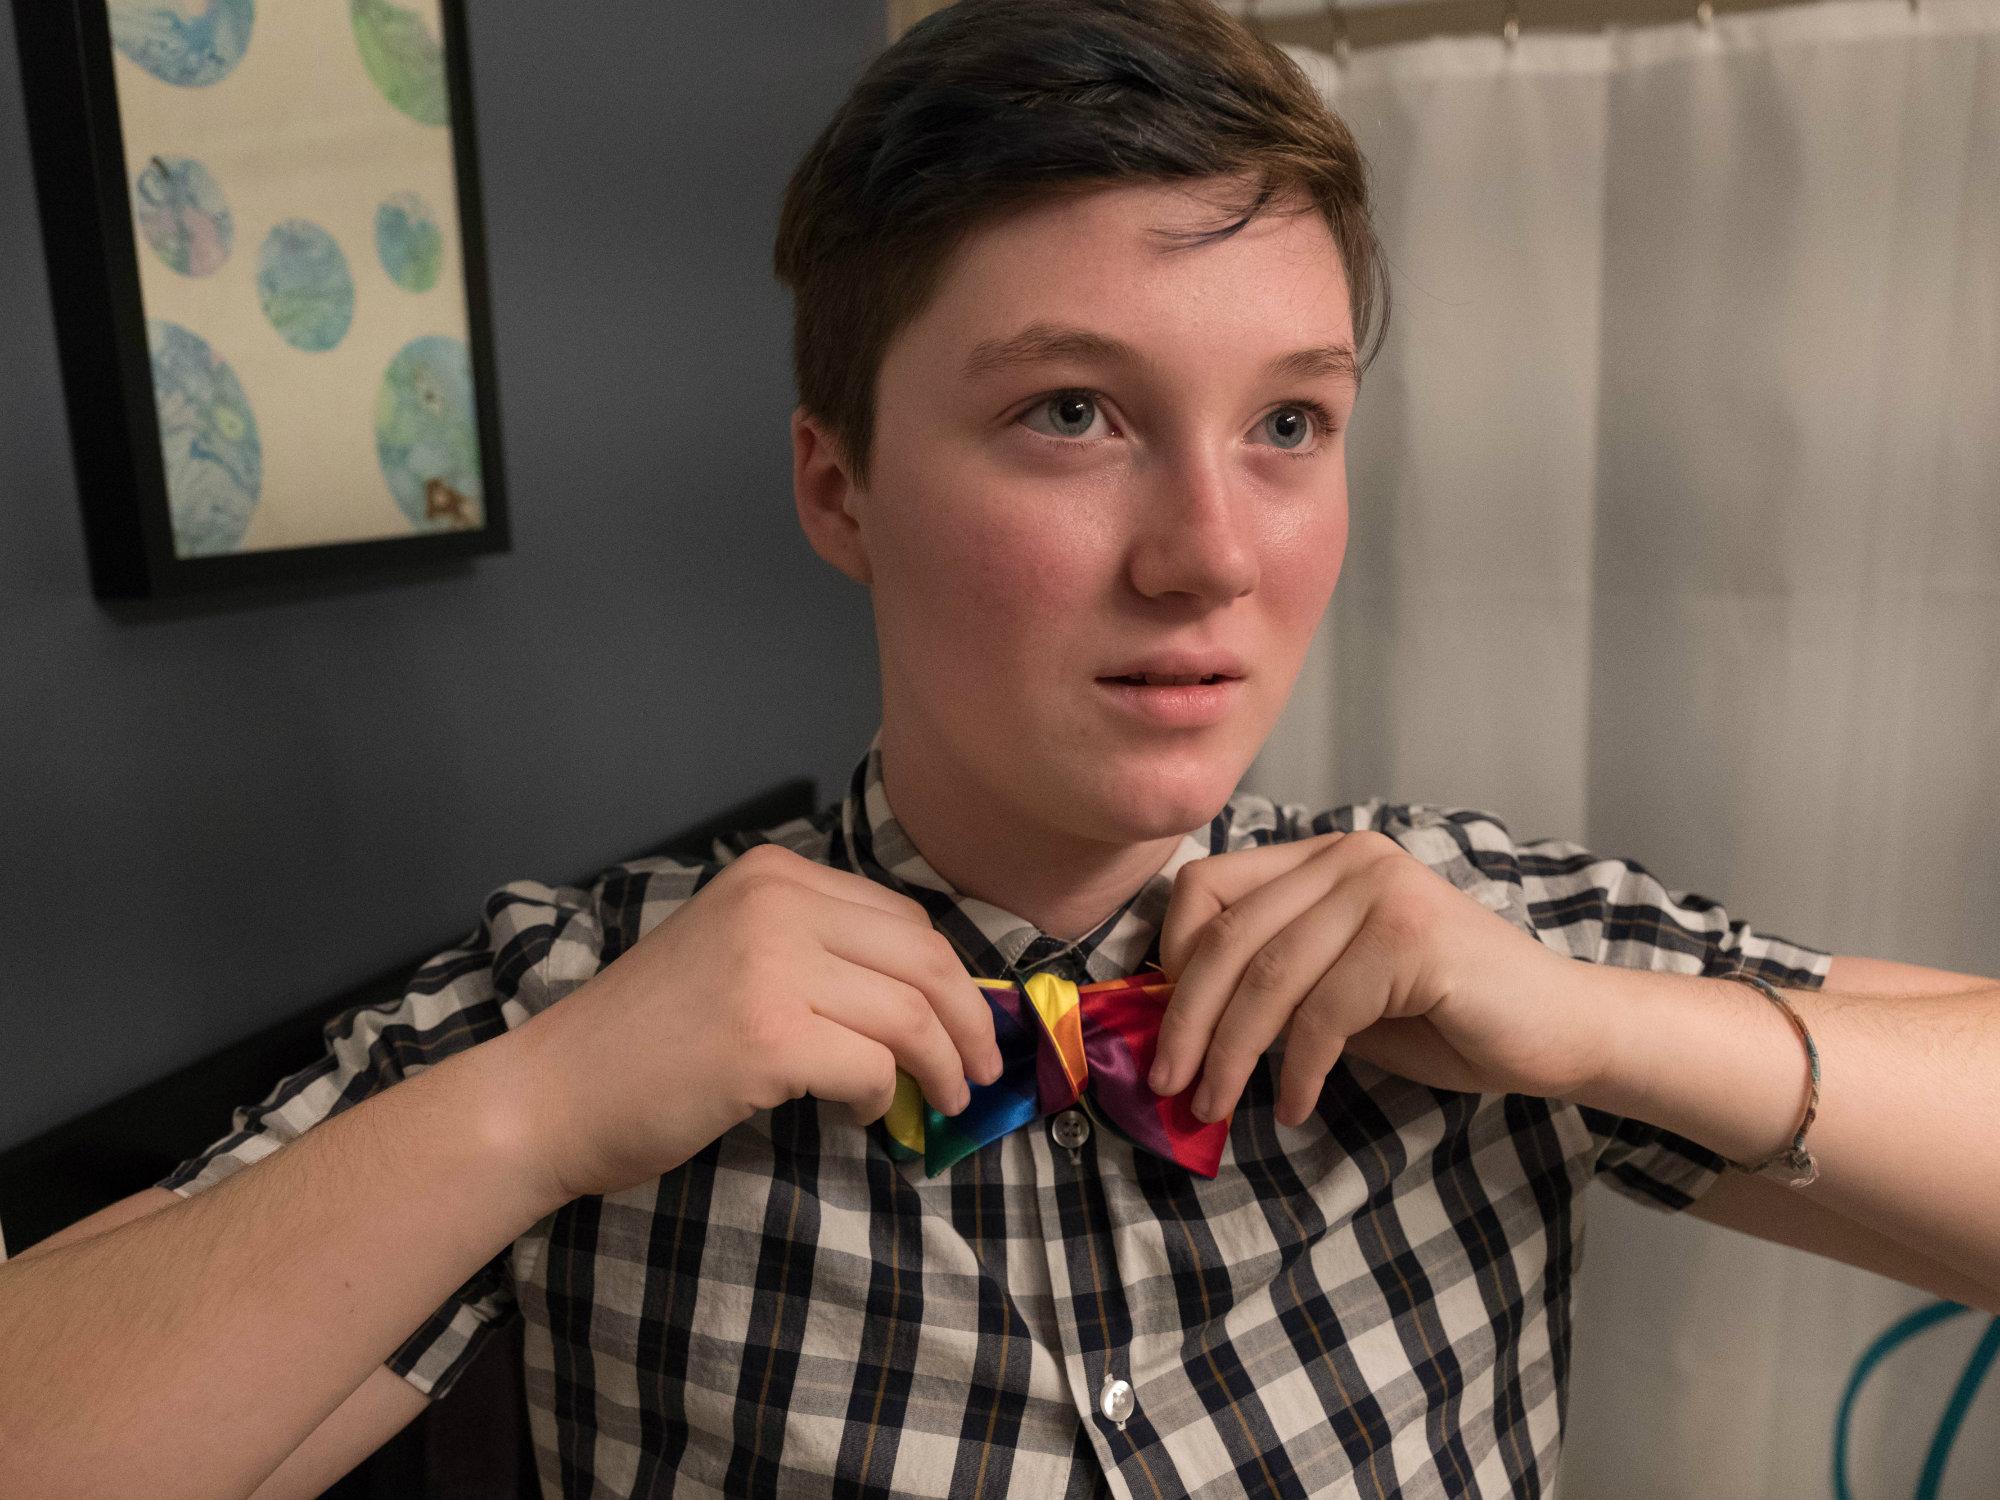 81f7c30bfce8 Insight  Transgender Teen On Getting Healthcare   Legislative ...